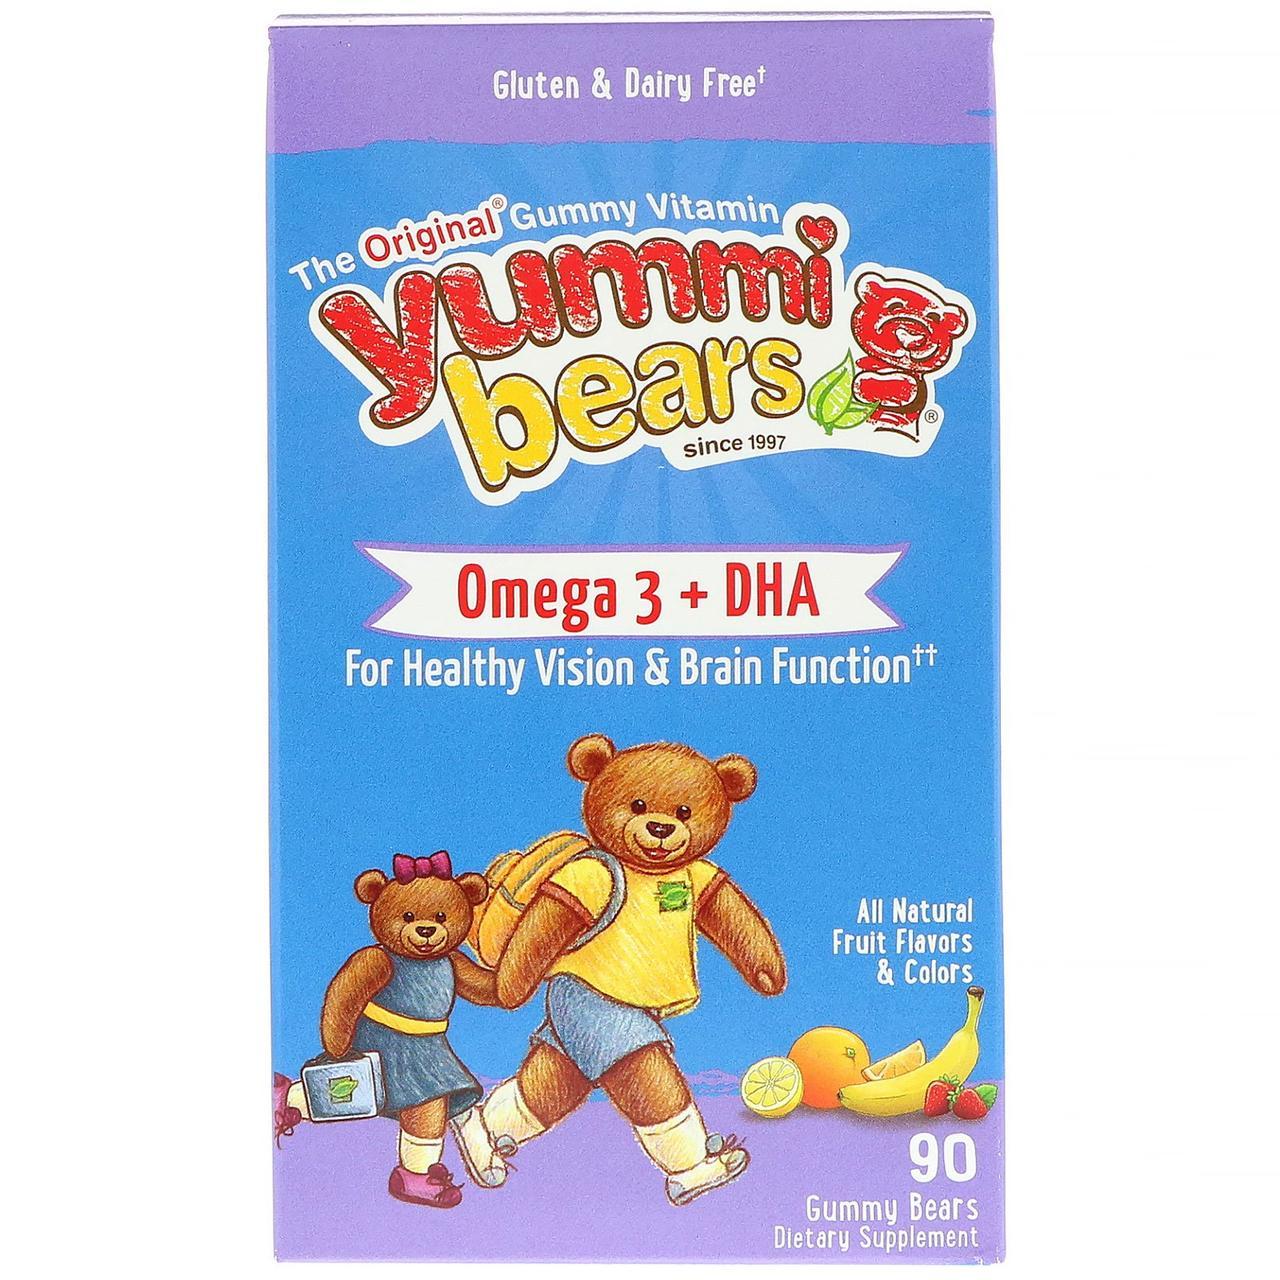 Рыбий жир для детей, Омега-3, Omega-3 + DHA, Hero Nutritional, 90шт